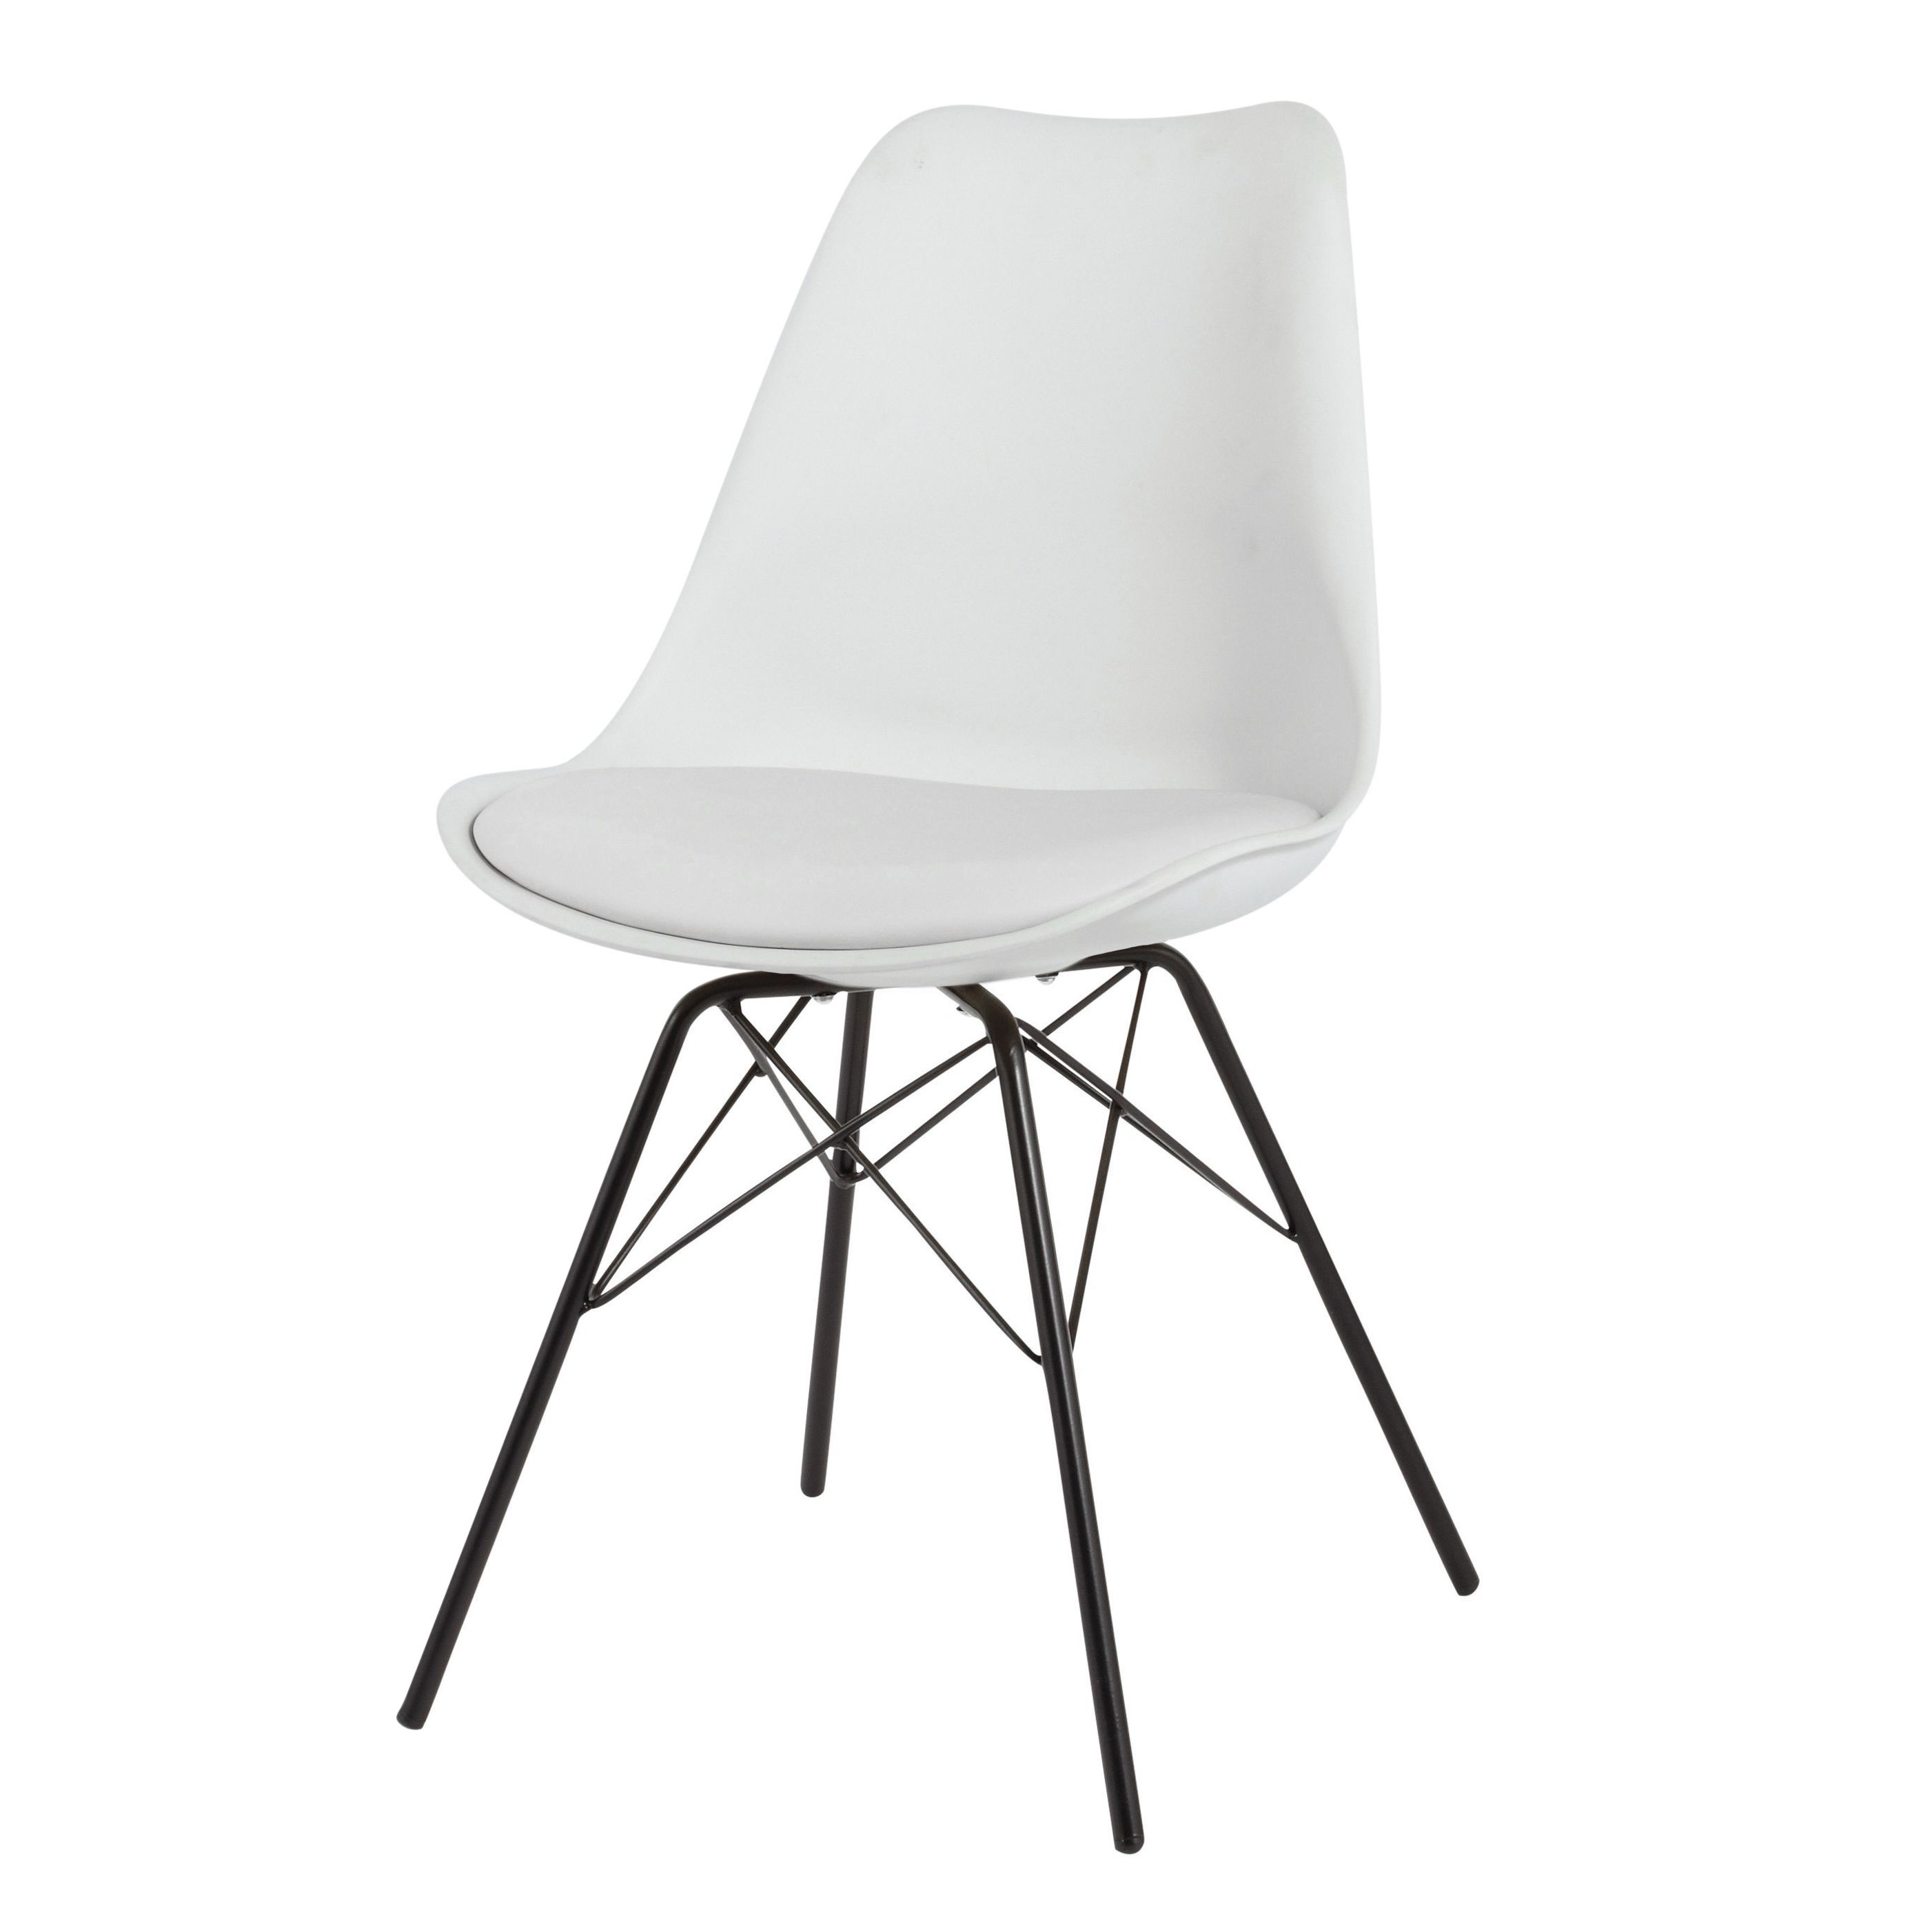 chaise blanche en polypropyl ne et m tal noir coventry On chaise metal noir